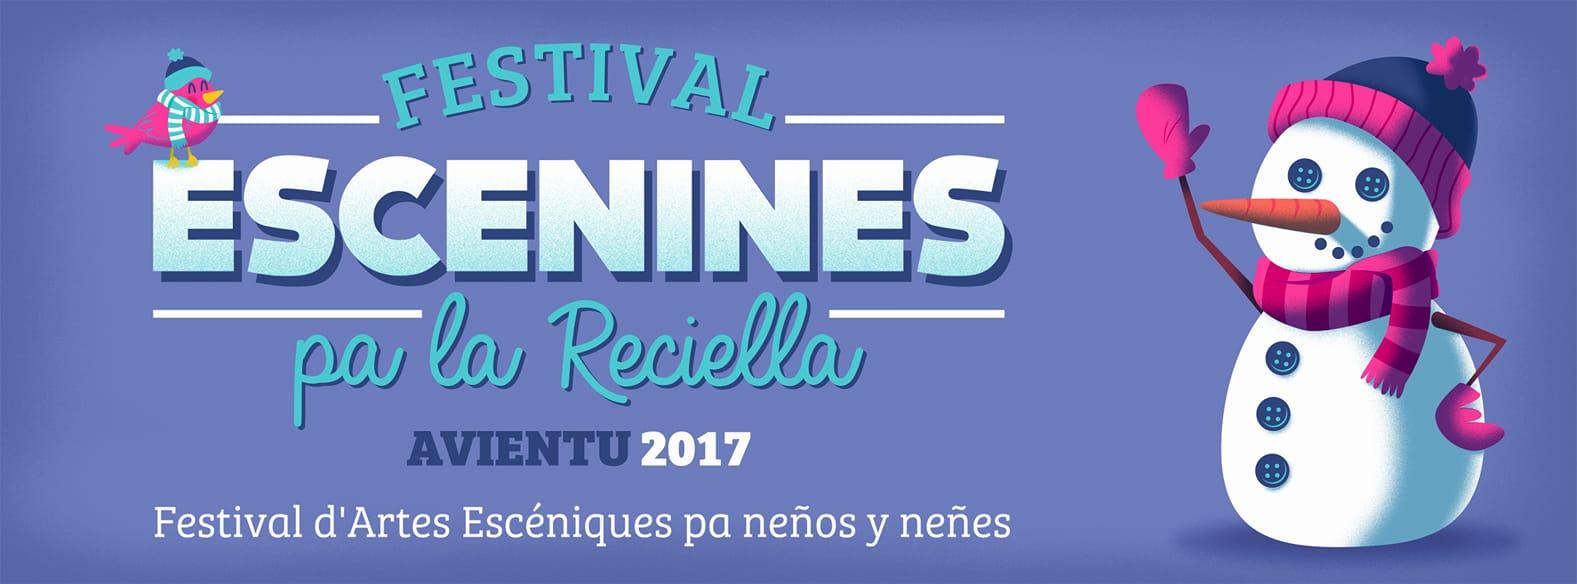 Cartelu Facebook V Festival Escenines pa la Reciella